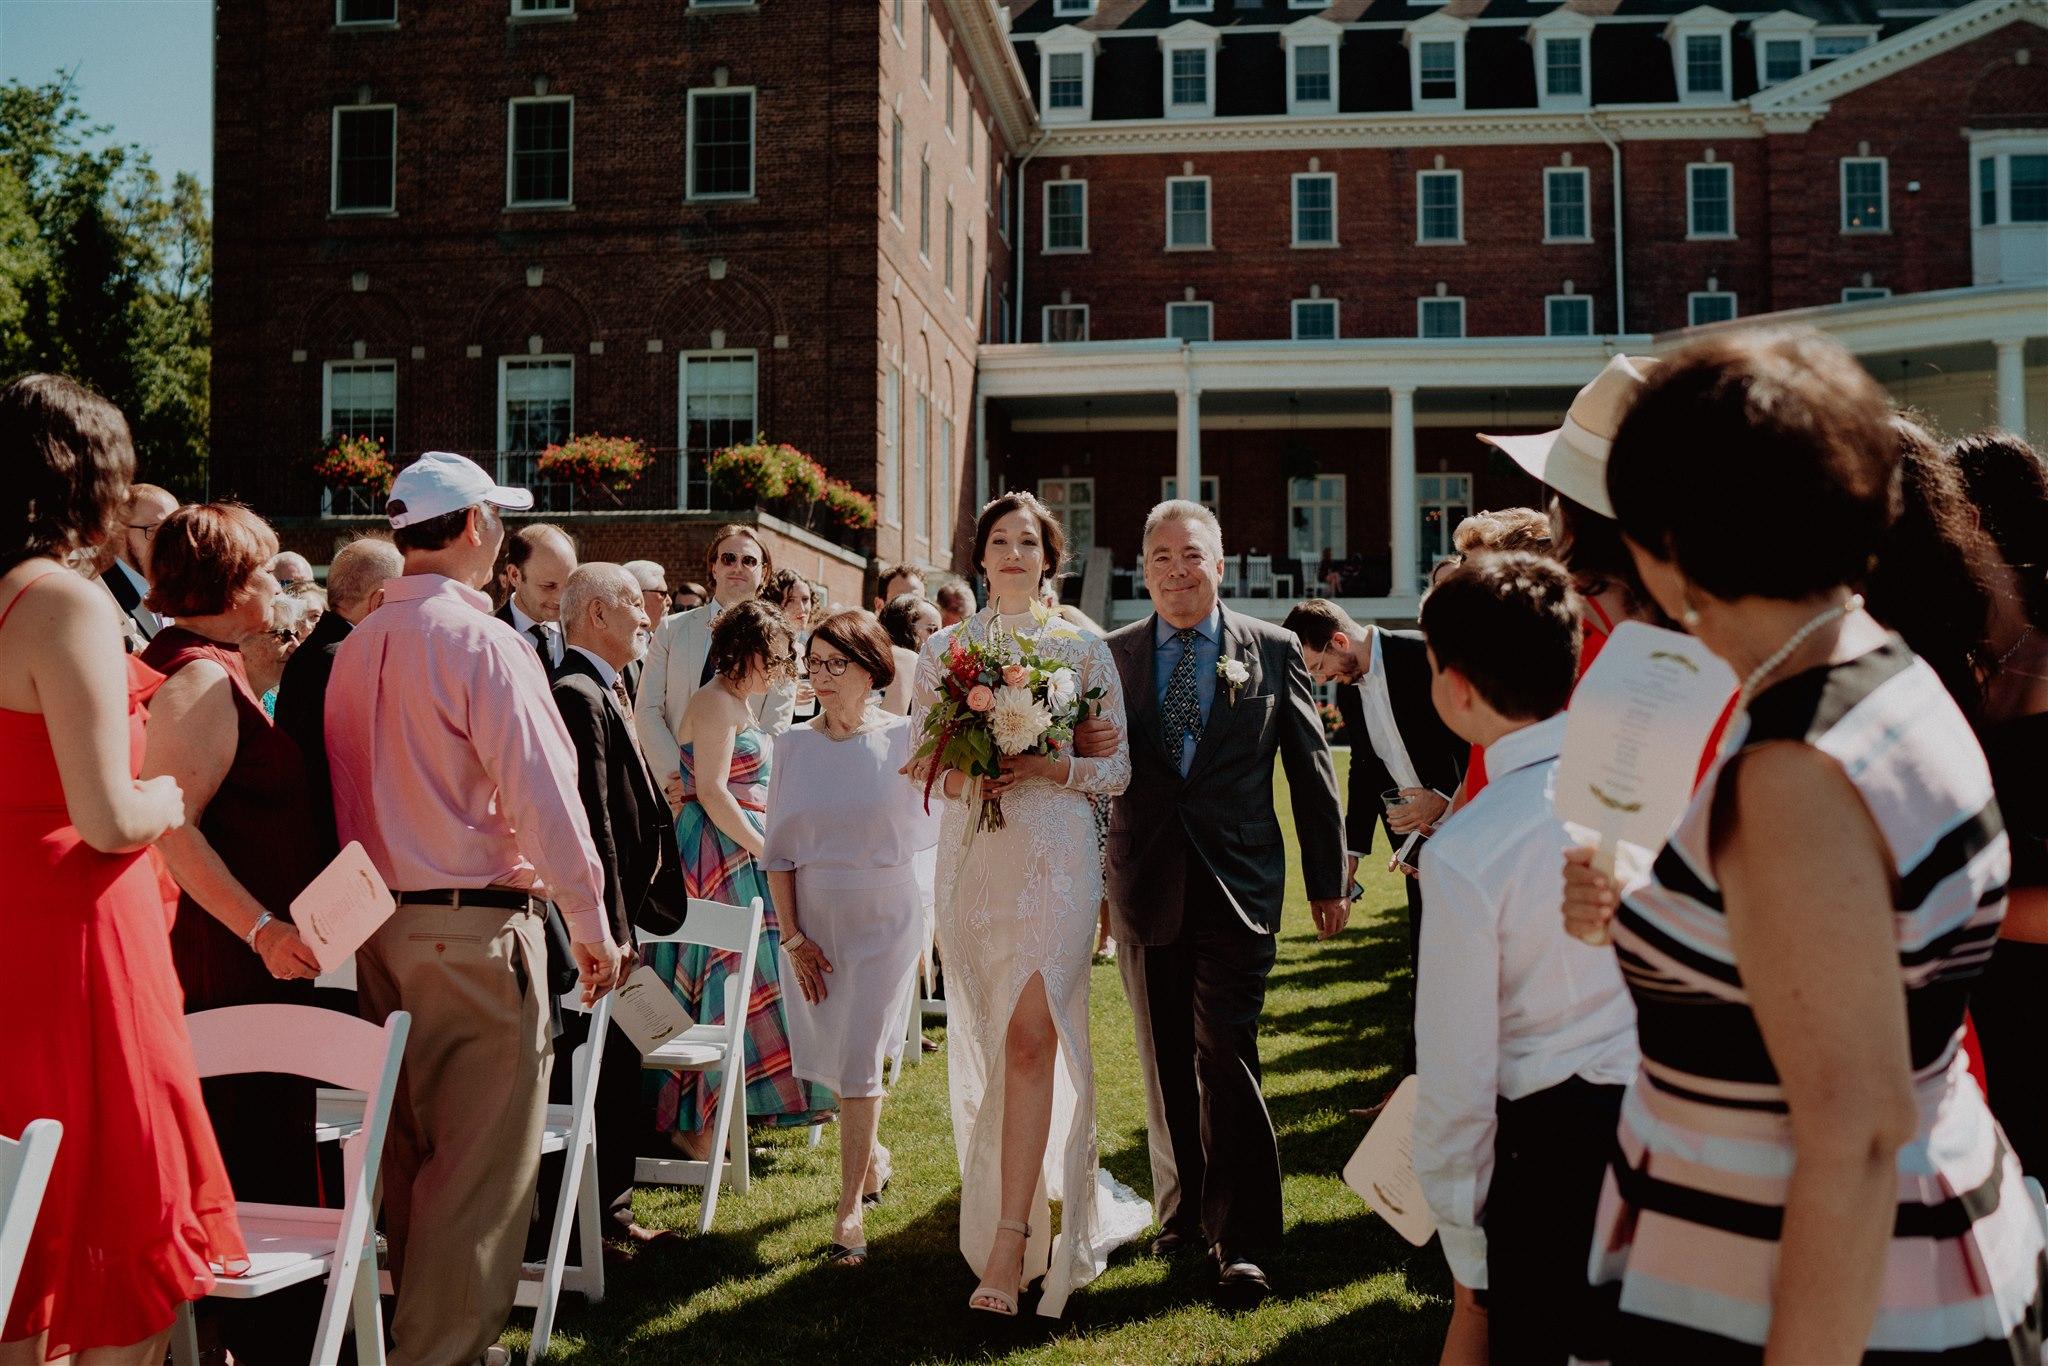 Chellise_Michael_Photography_Hudson_Valley_Wedding_Photographer_Otesaga_Hotel-3054.jpg